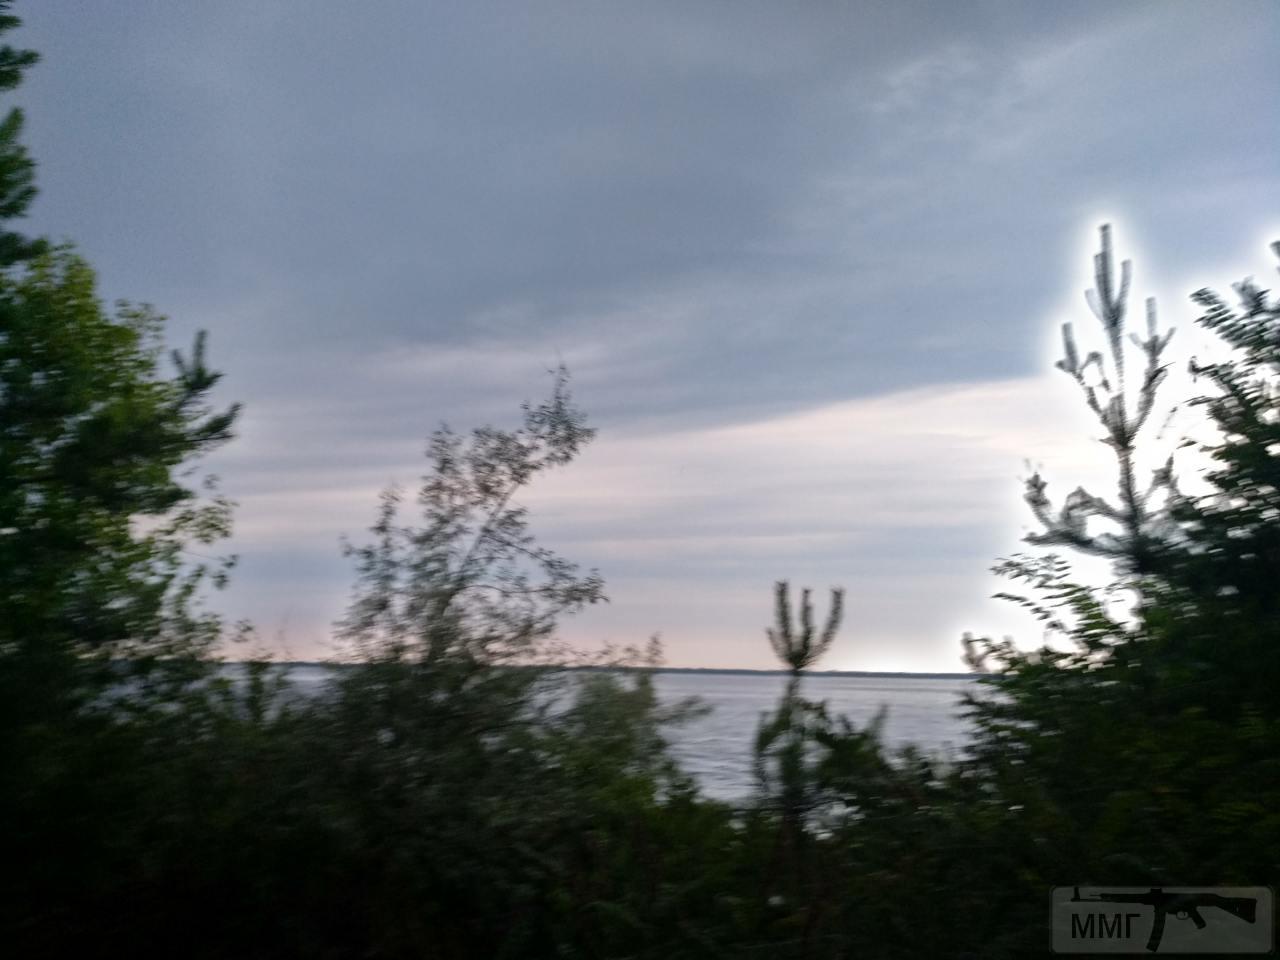 28706 - Копарські дні і будні.